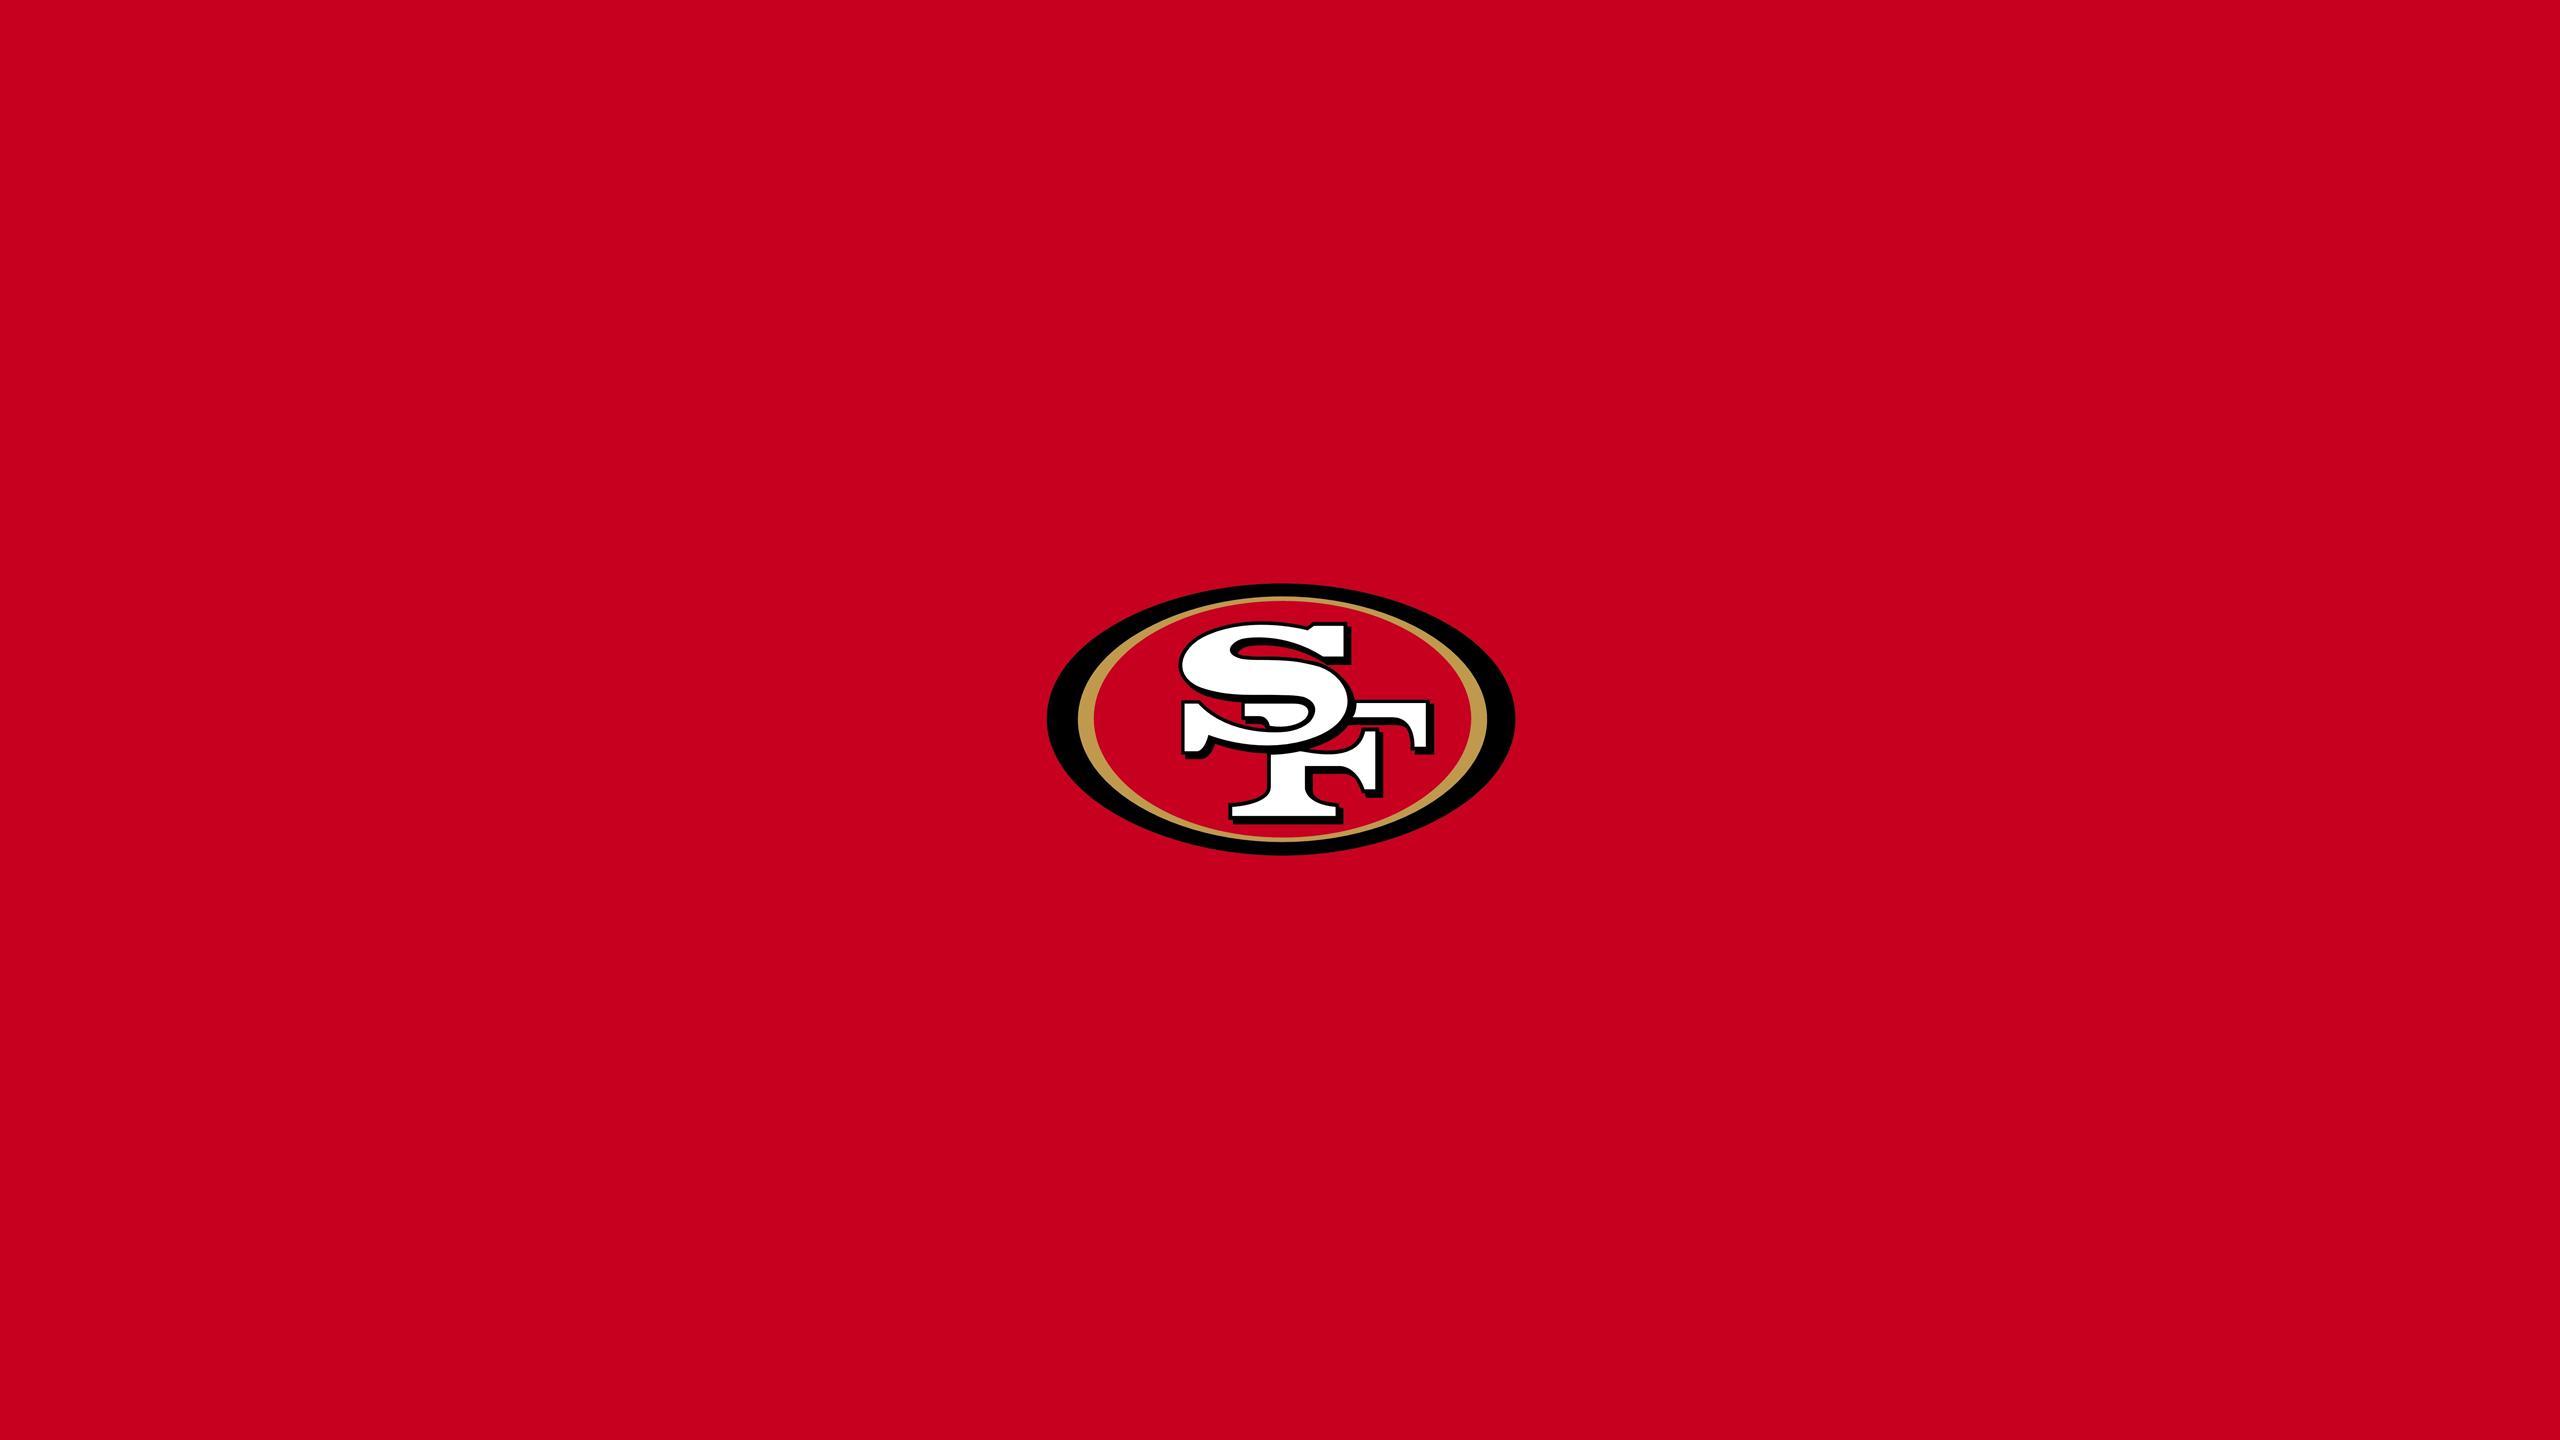 San Francisco 49ers Wallpapers 2015 2560x1440